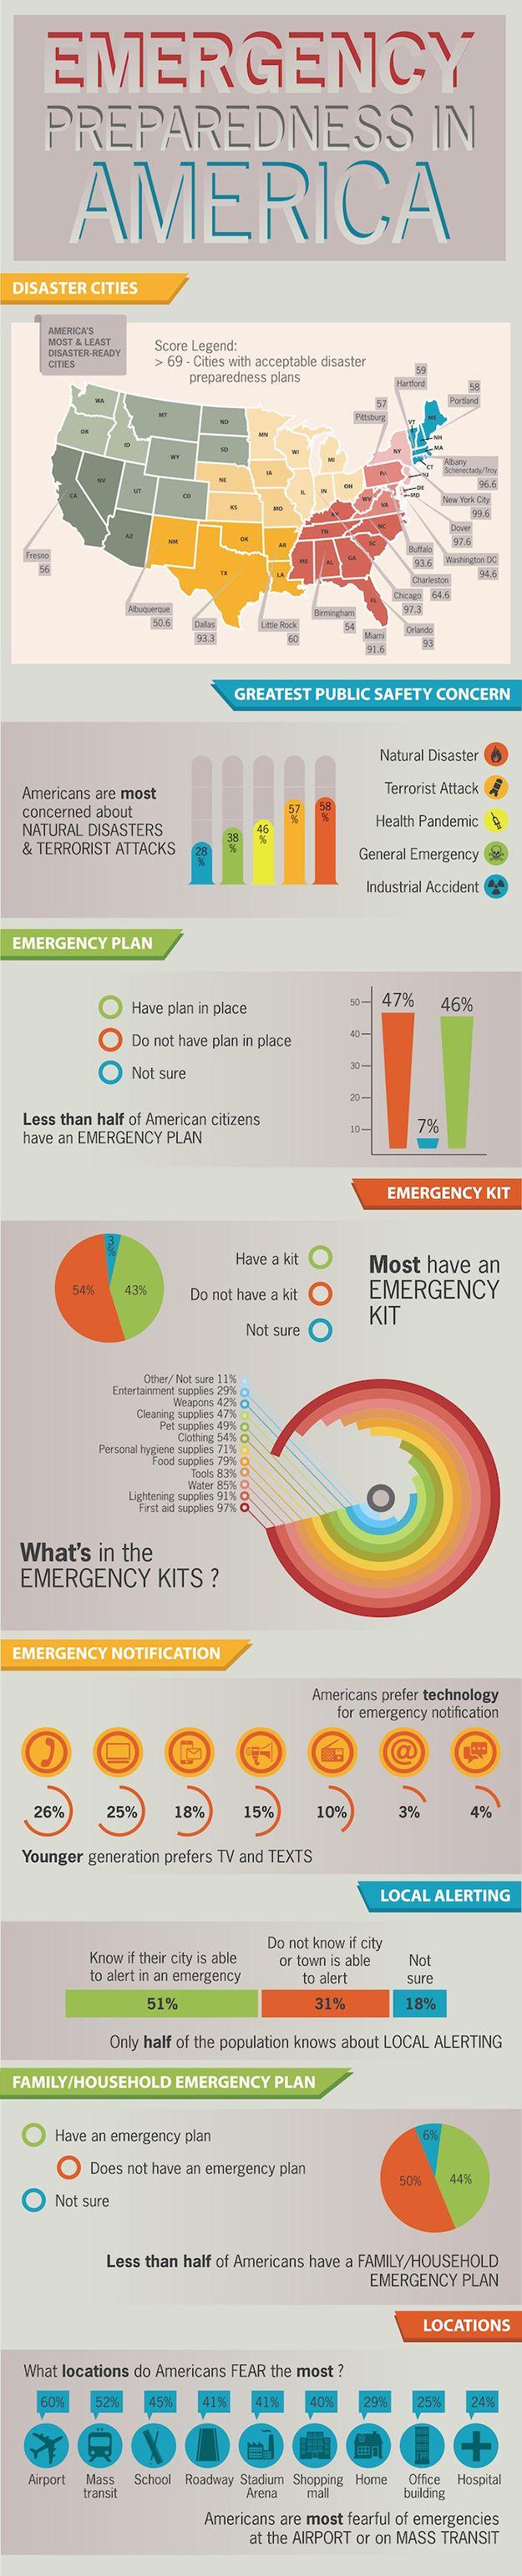 Emergency Preparedness in the U.S. | Infographic #SurvivalLife www.SurvivalLife.com